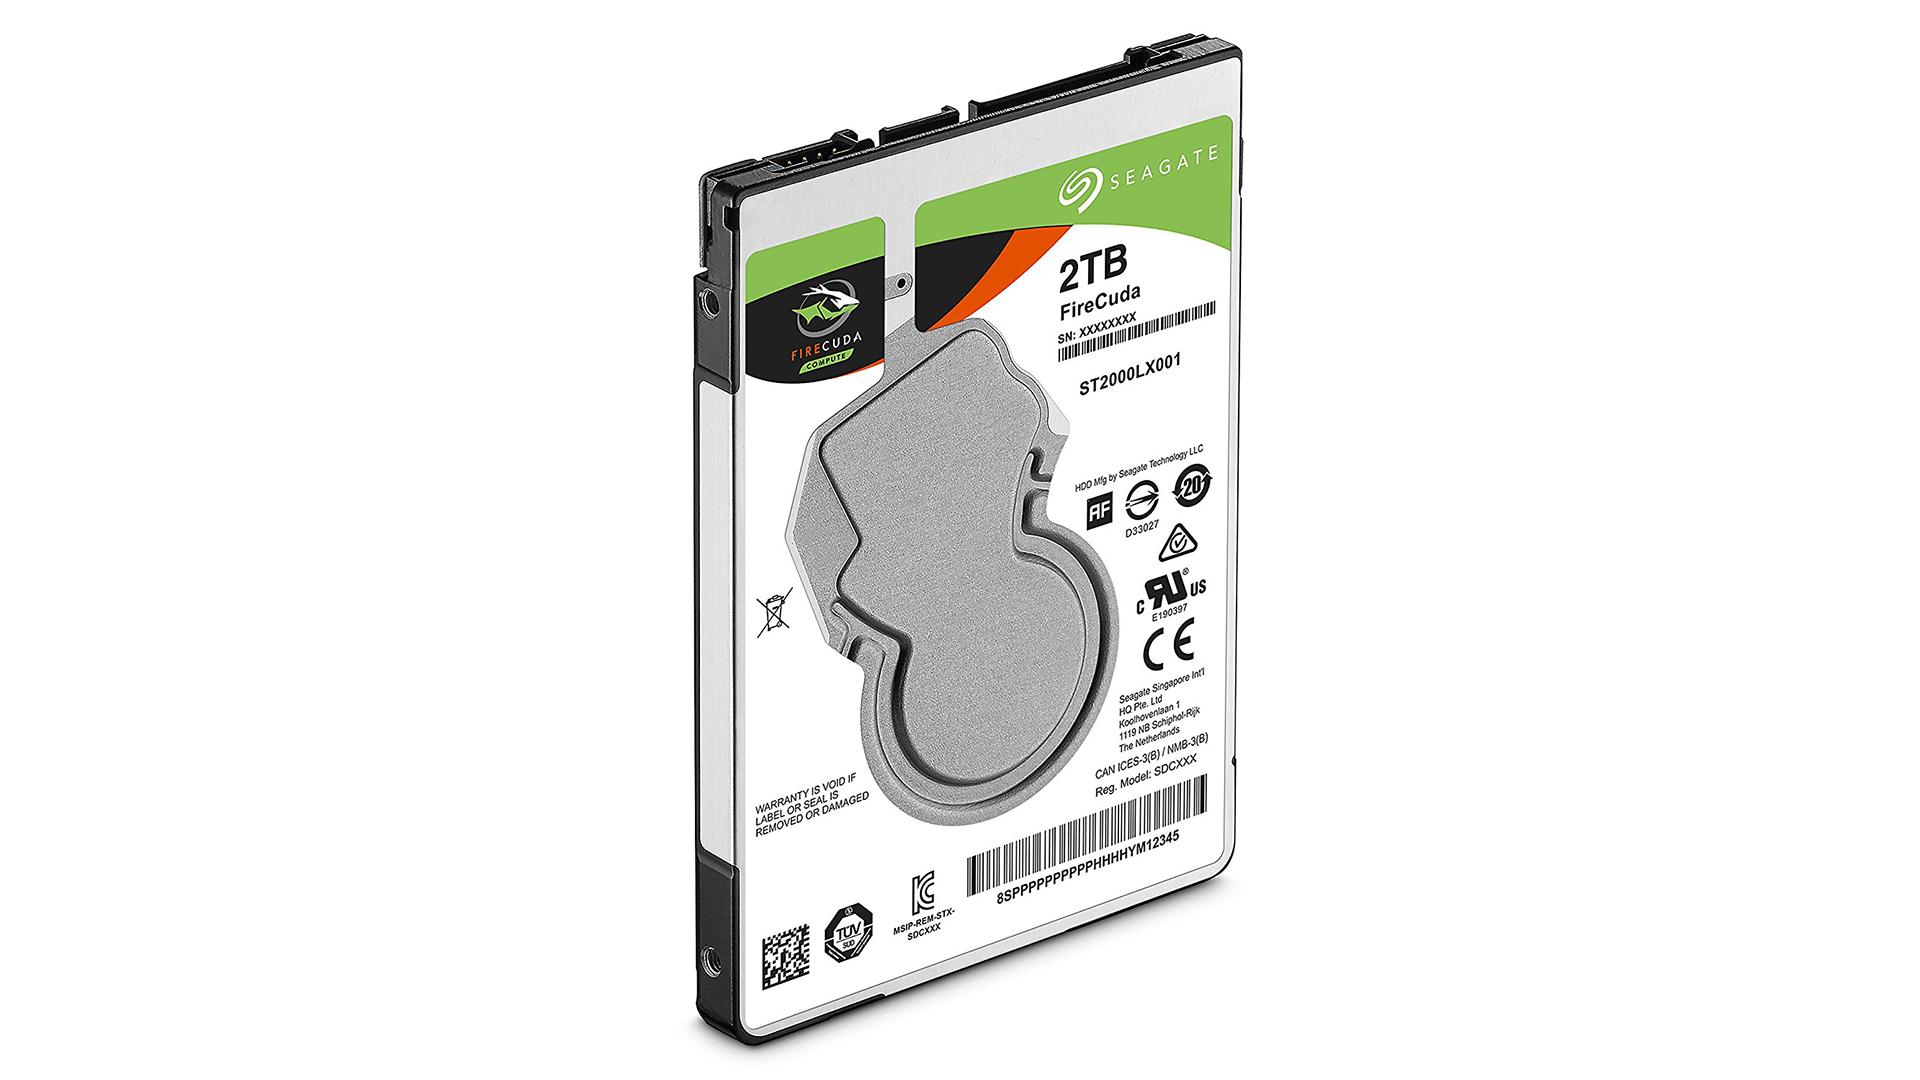 Best laptop hard drive: Seagate FireCuda Mobile